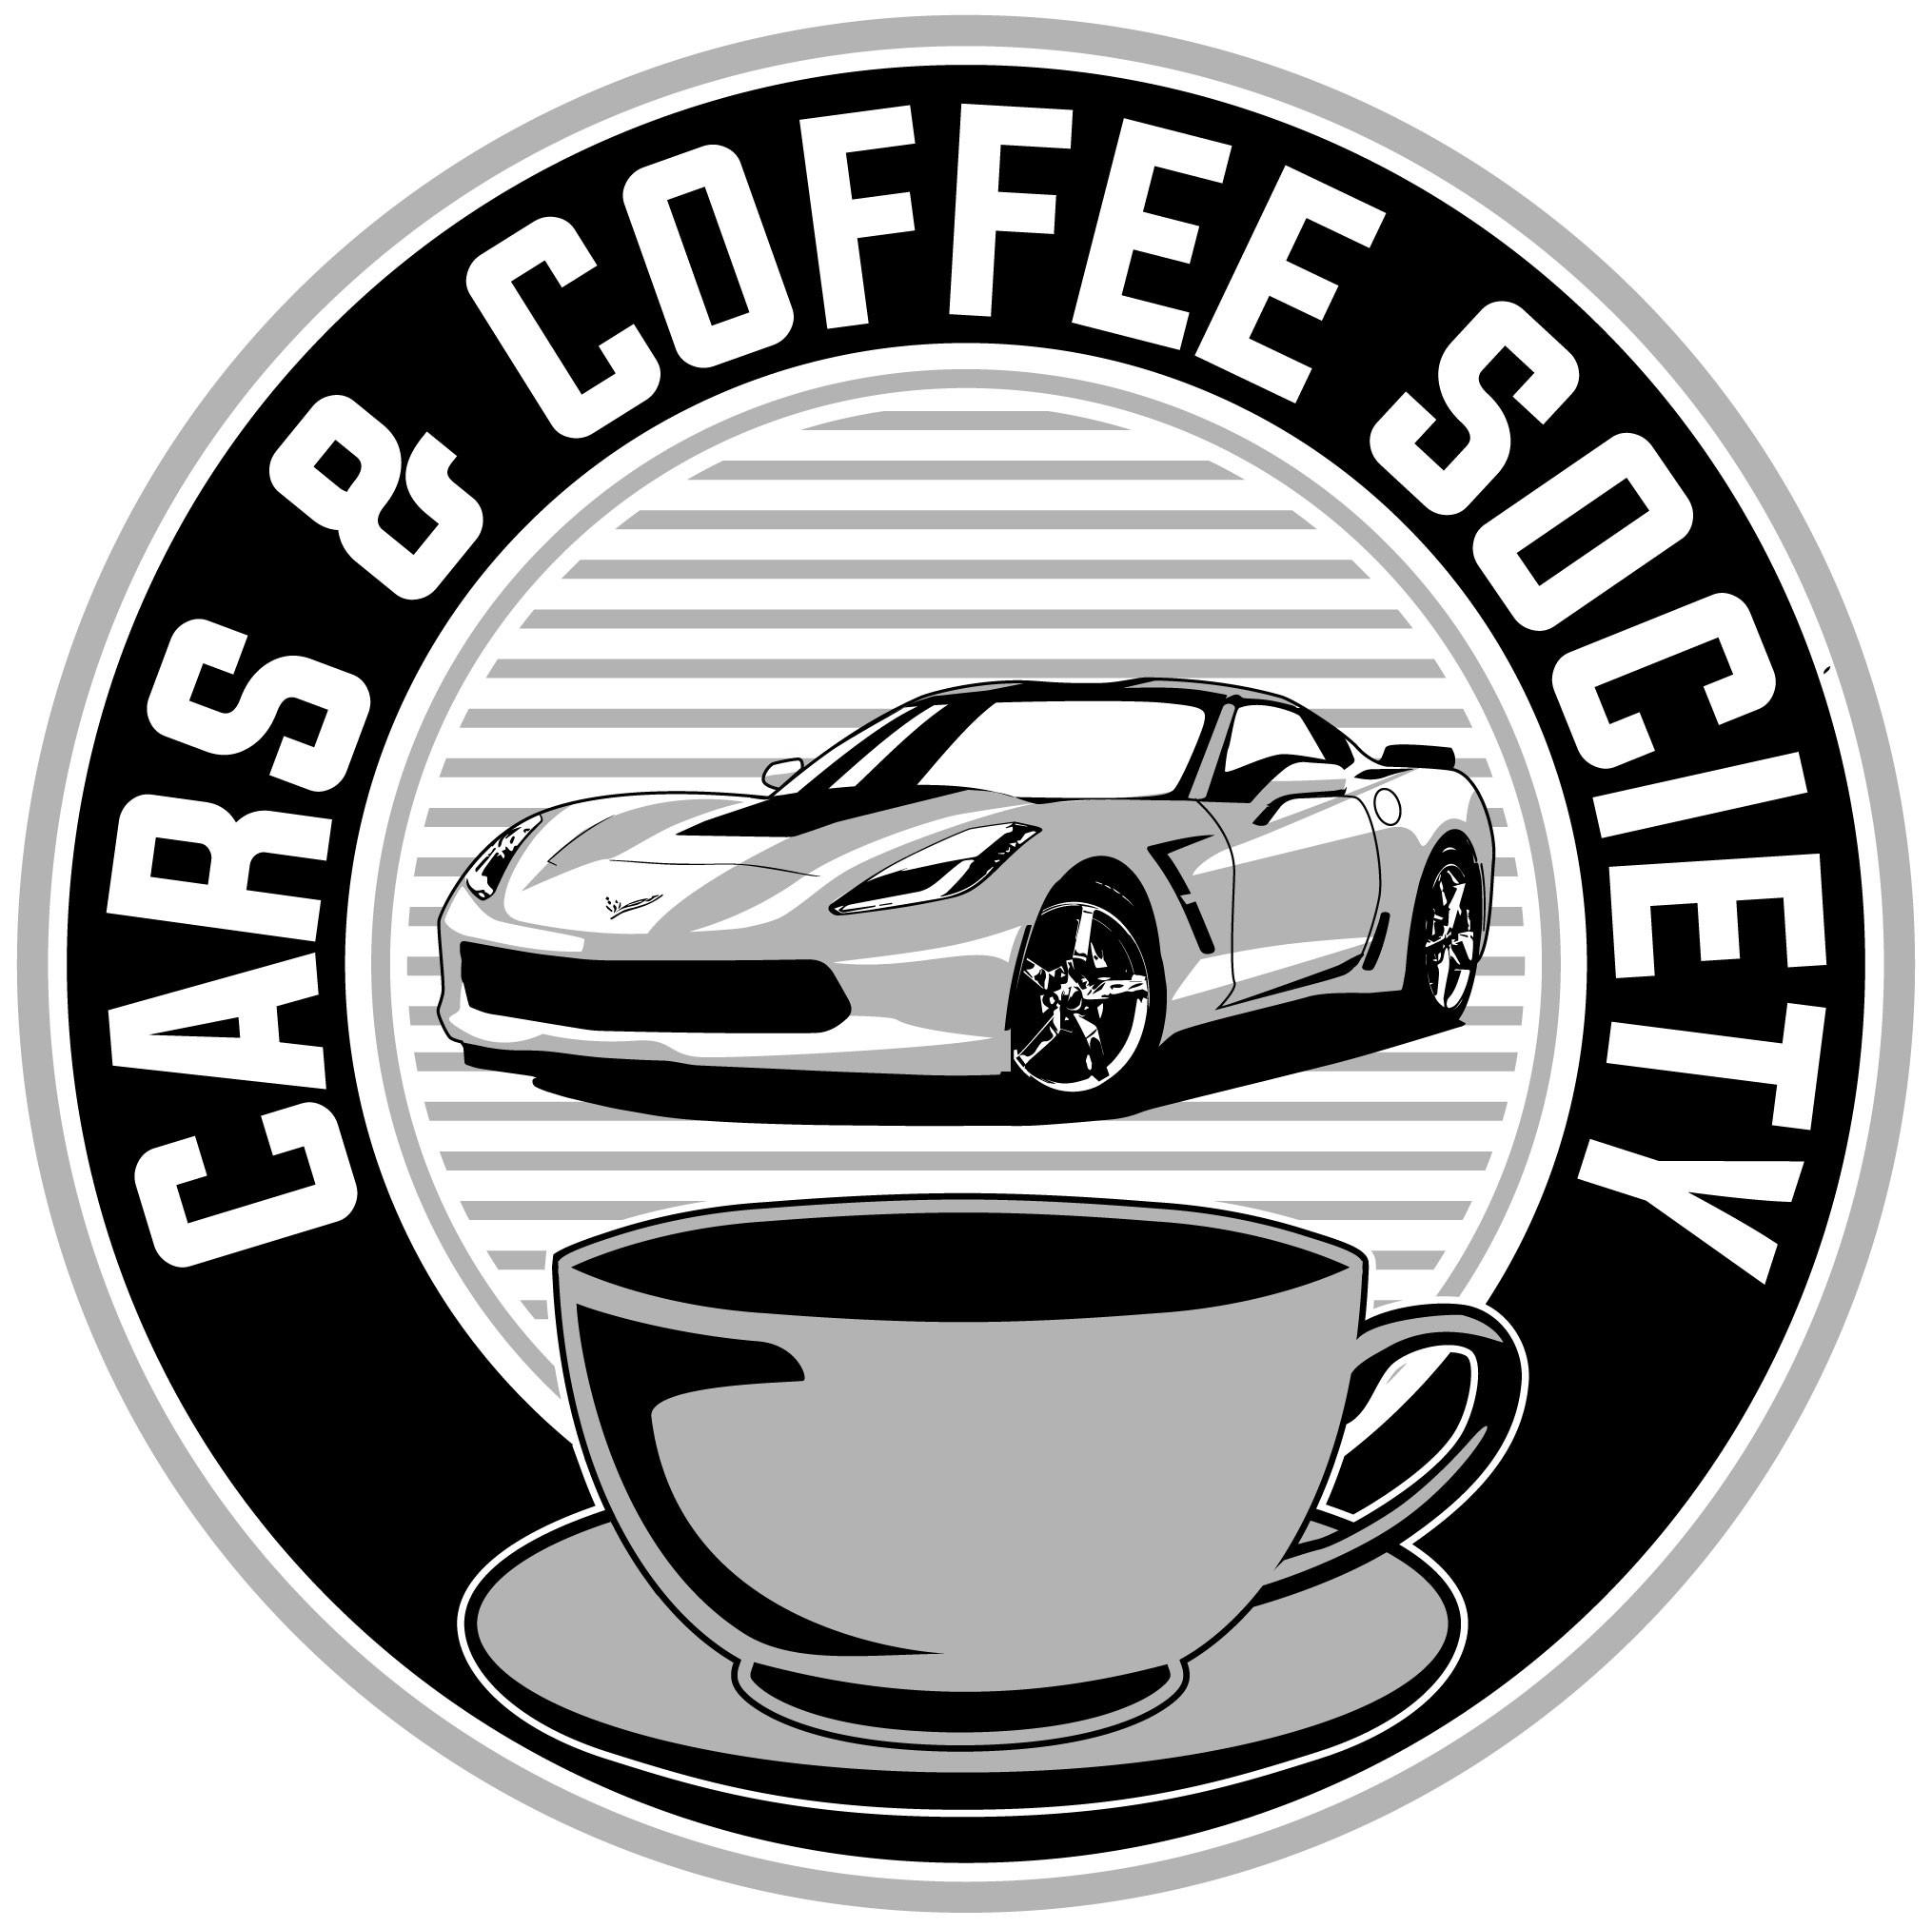 Camaro-Corvette T-shirt